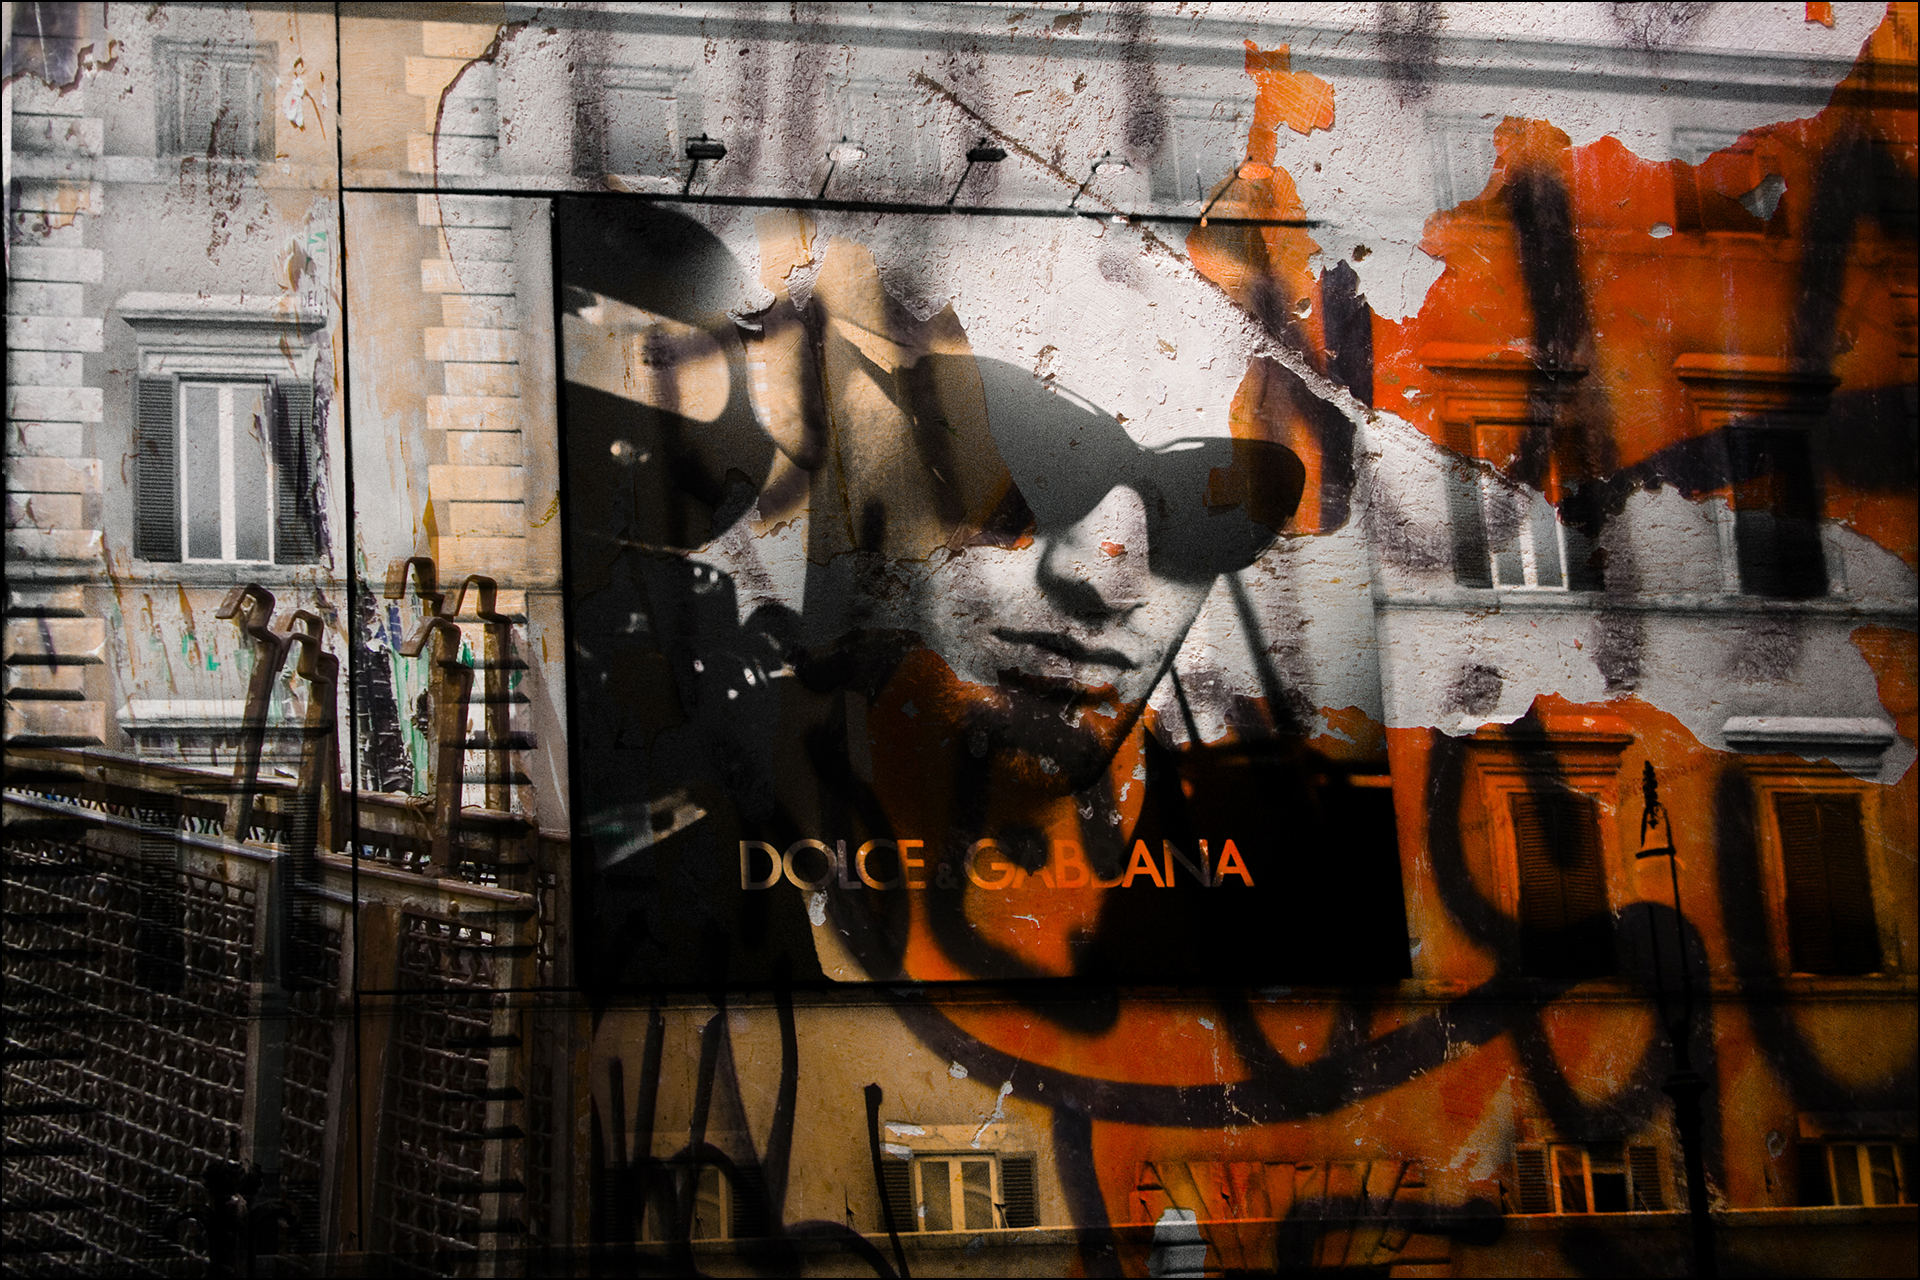 _MG_1847mix roma div artistic 05052006